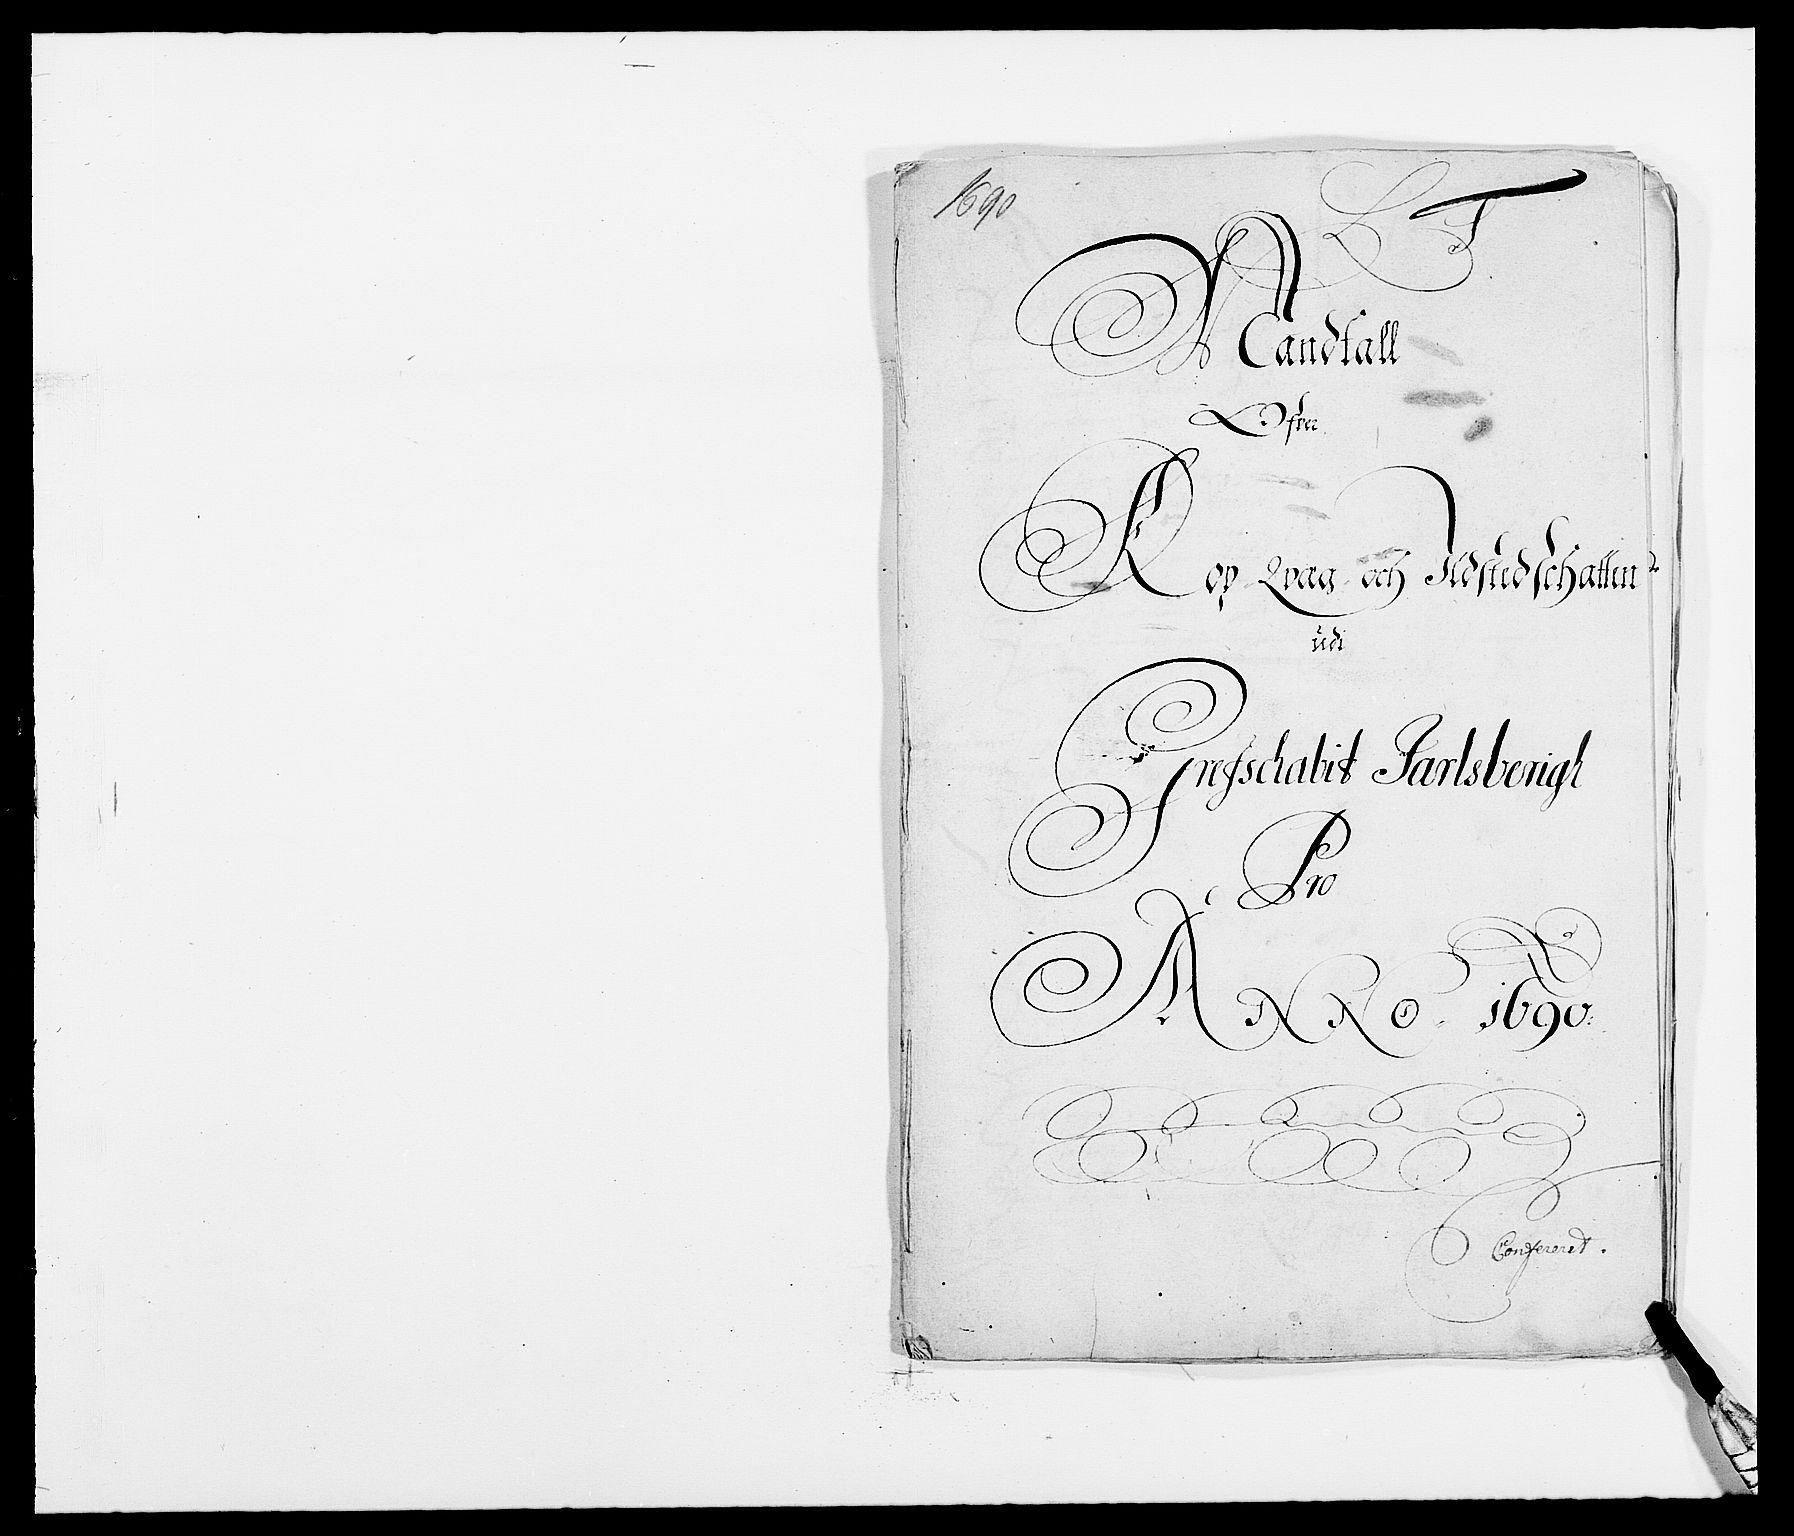 RA, Rentekammeret inntil 1814, Reviderte regnskaper, Fogderegnskap, R32/L1861: Fogderegnskap Jarlsberg grevskap, 1686-1690, s. 329